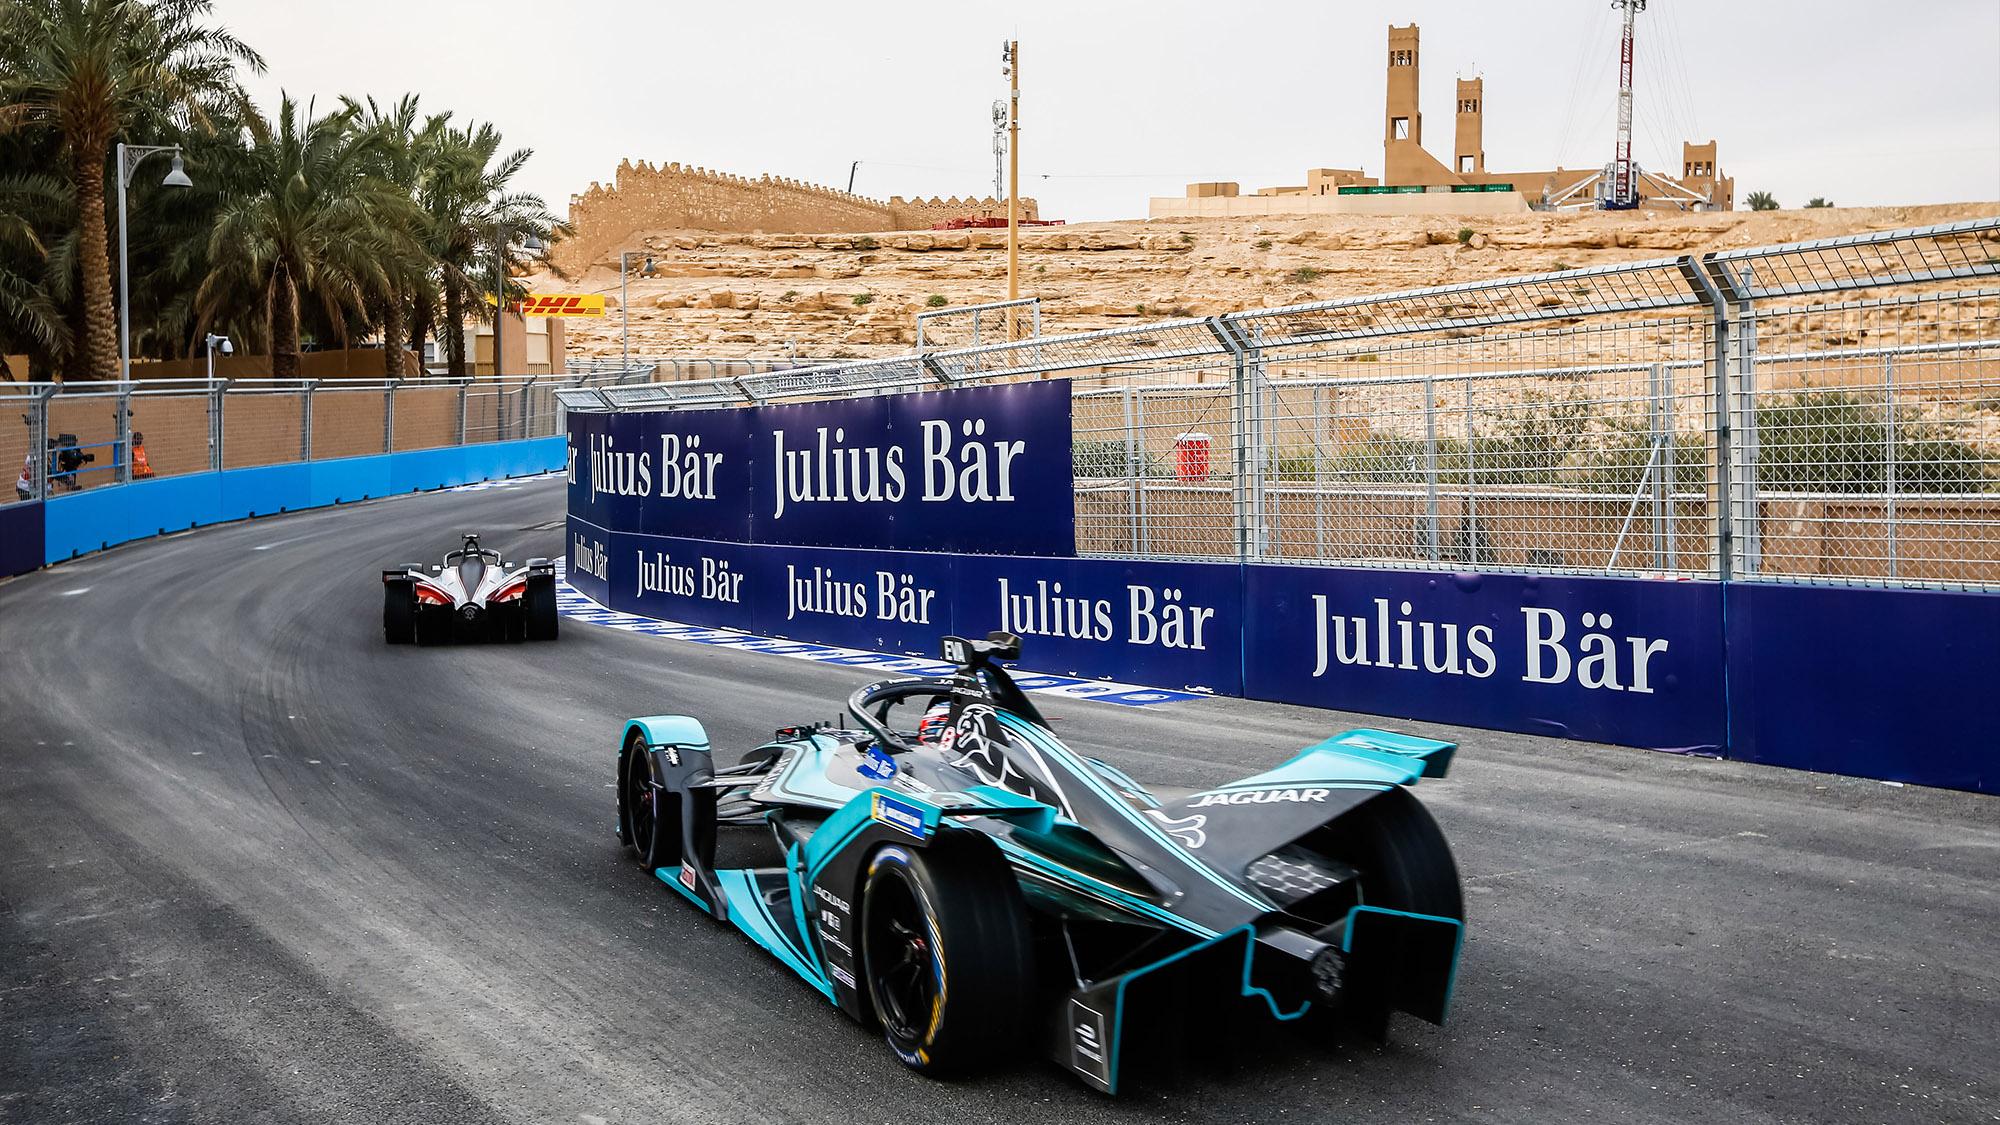 2019 Formula E race in Saudi Arabia